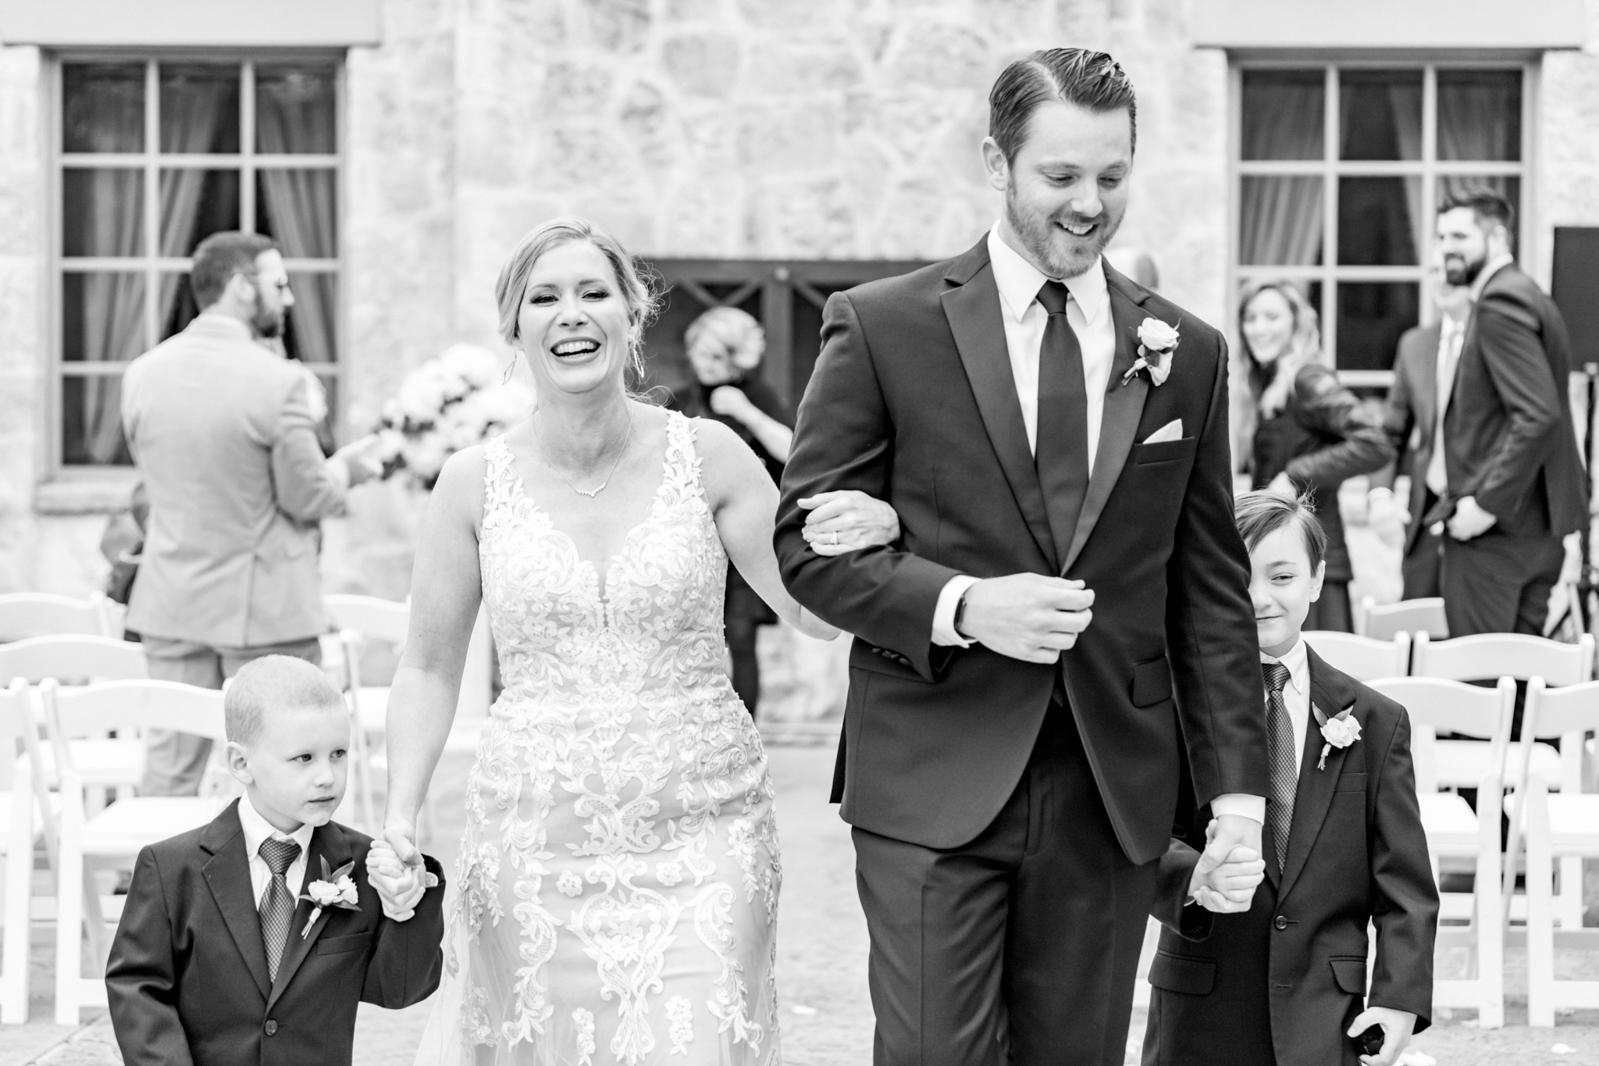 San Antonio Austin Boerne New Braunfels Texas Wedding Engagement Photographer Photography Hill Country Texas JW Marriott Sunday House Wedding Spring Wedding Coral Pink Intimate Wedding San Antonio Austin Texas photographer 38